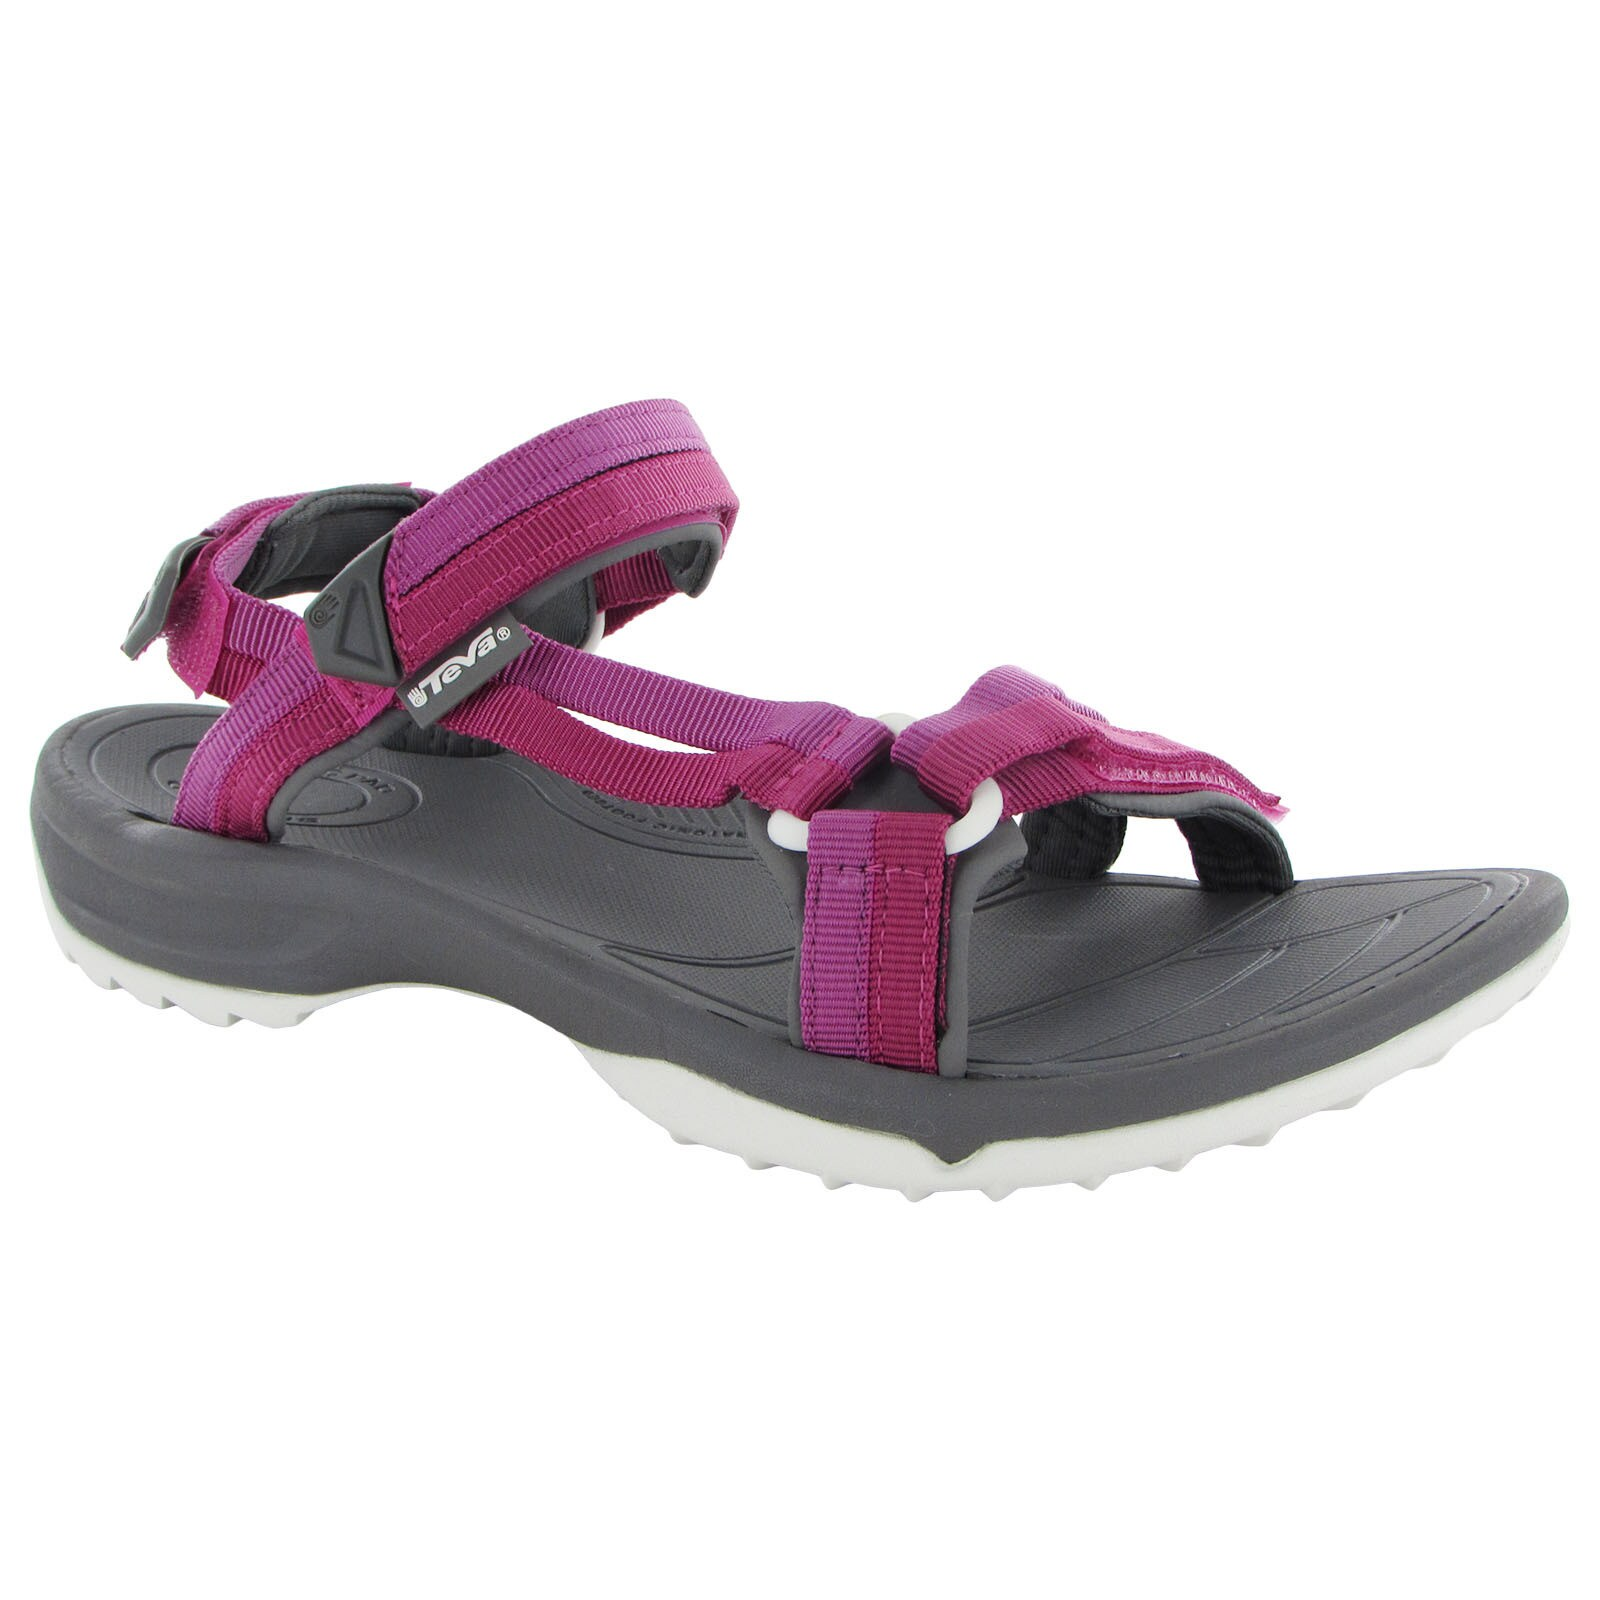 c8e10ced390a Shop Teva Womens Terra Fi Lite Sport Sandals - Free Shipping Today ...